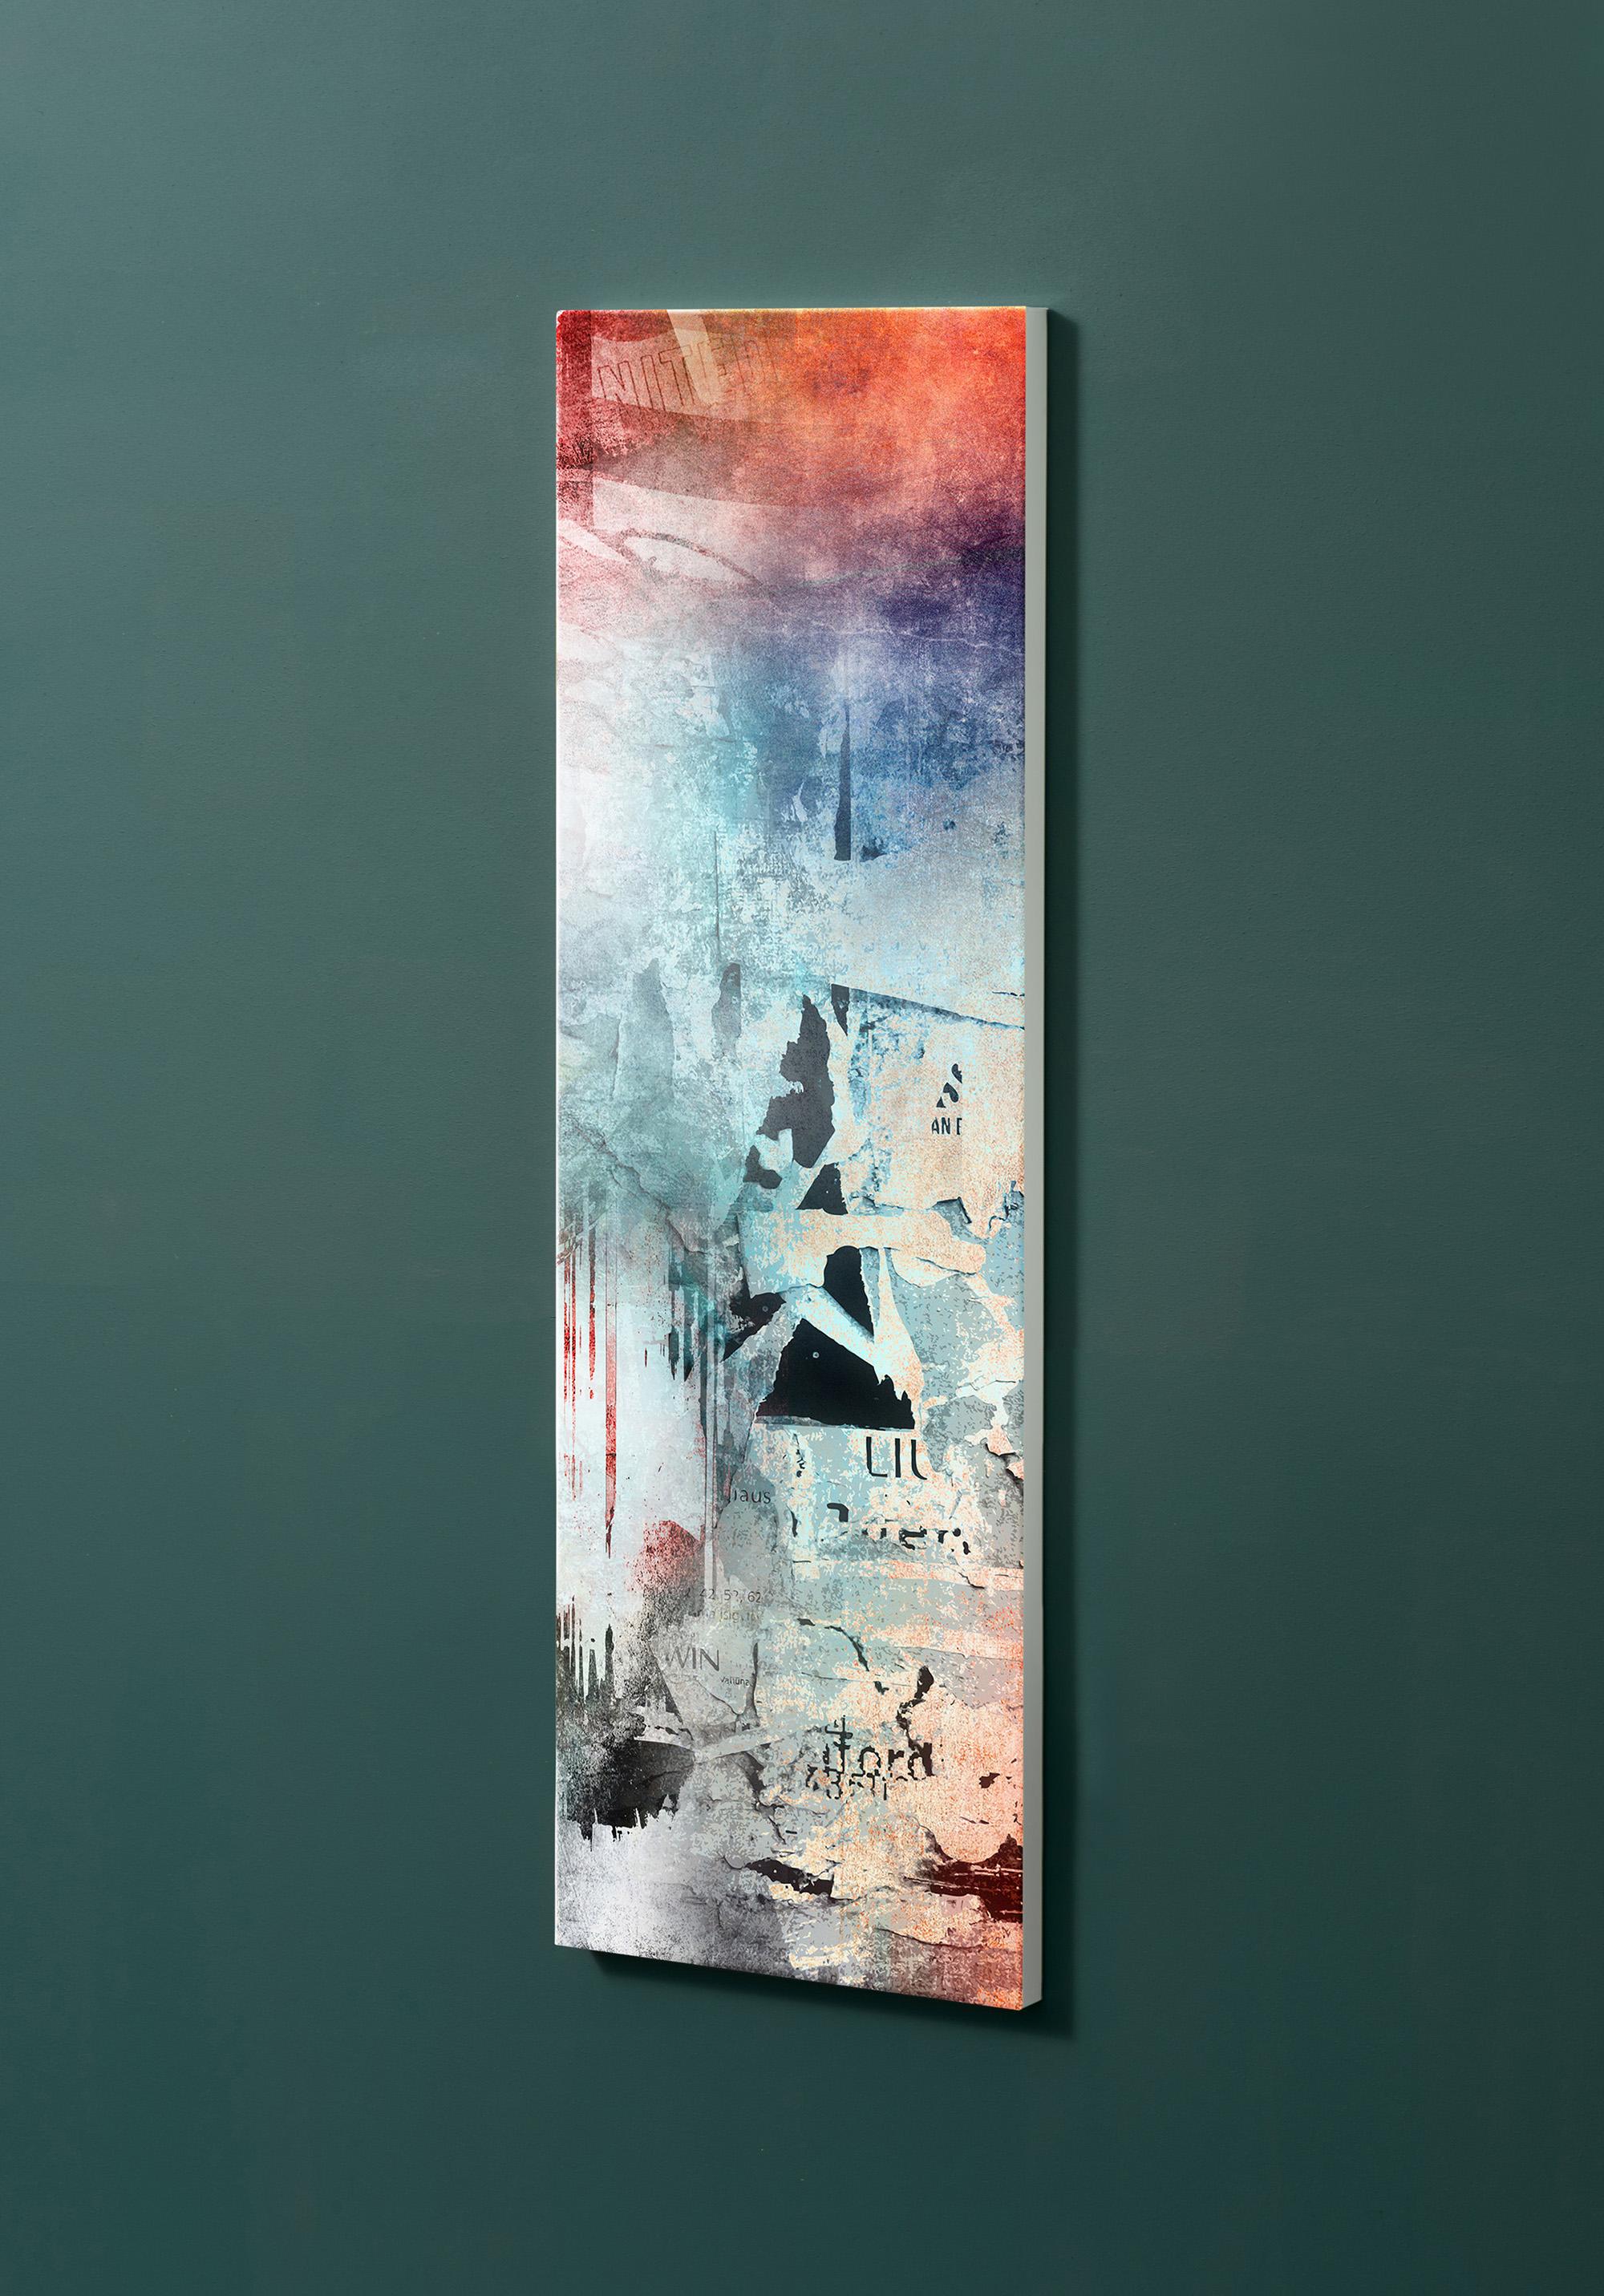 Magnettafel NOTIZ 30x90cm Motiv-Pinnwand M25 Abstrakt Kunst